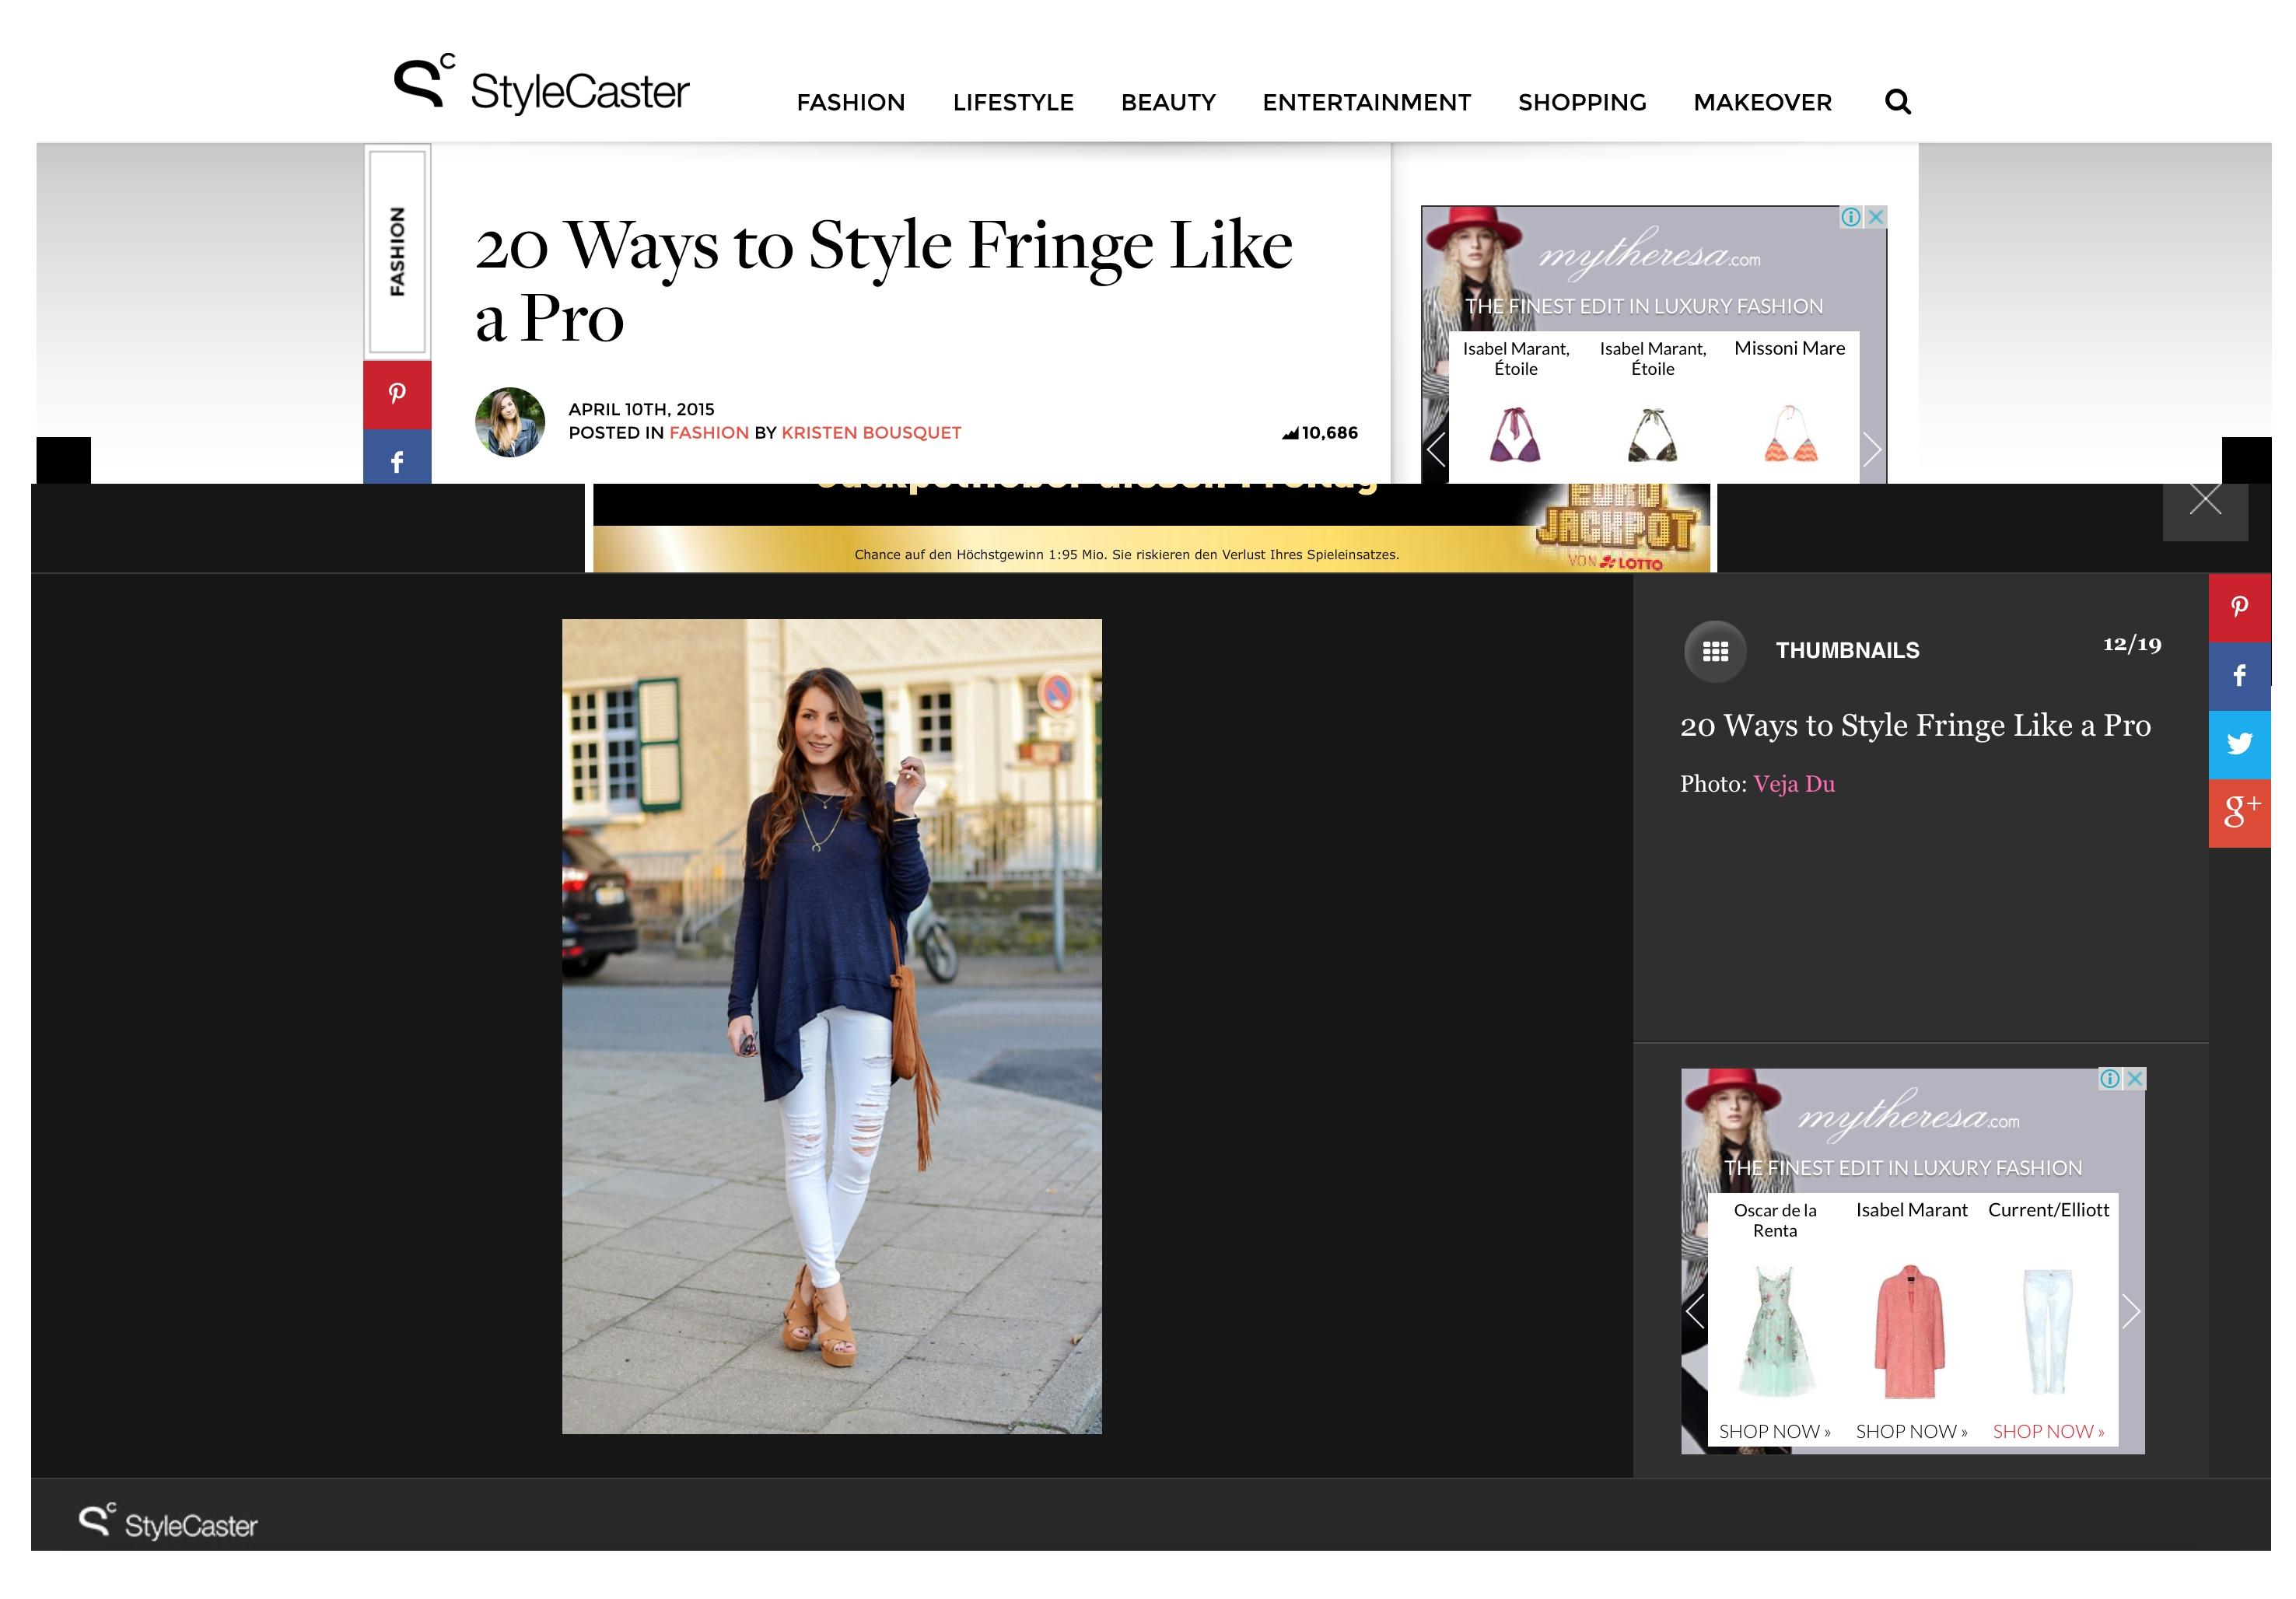 stylecaster how to wear fringe like a pro